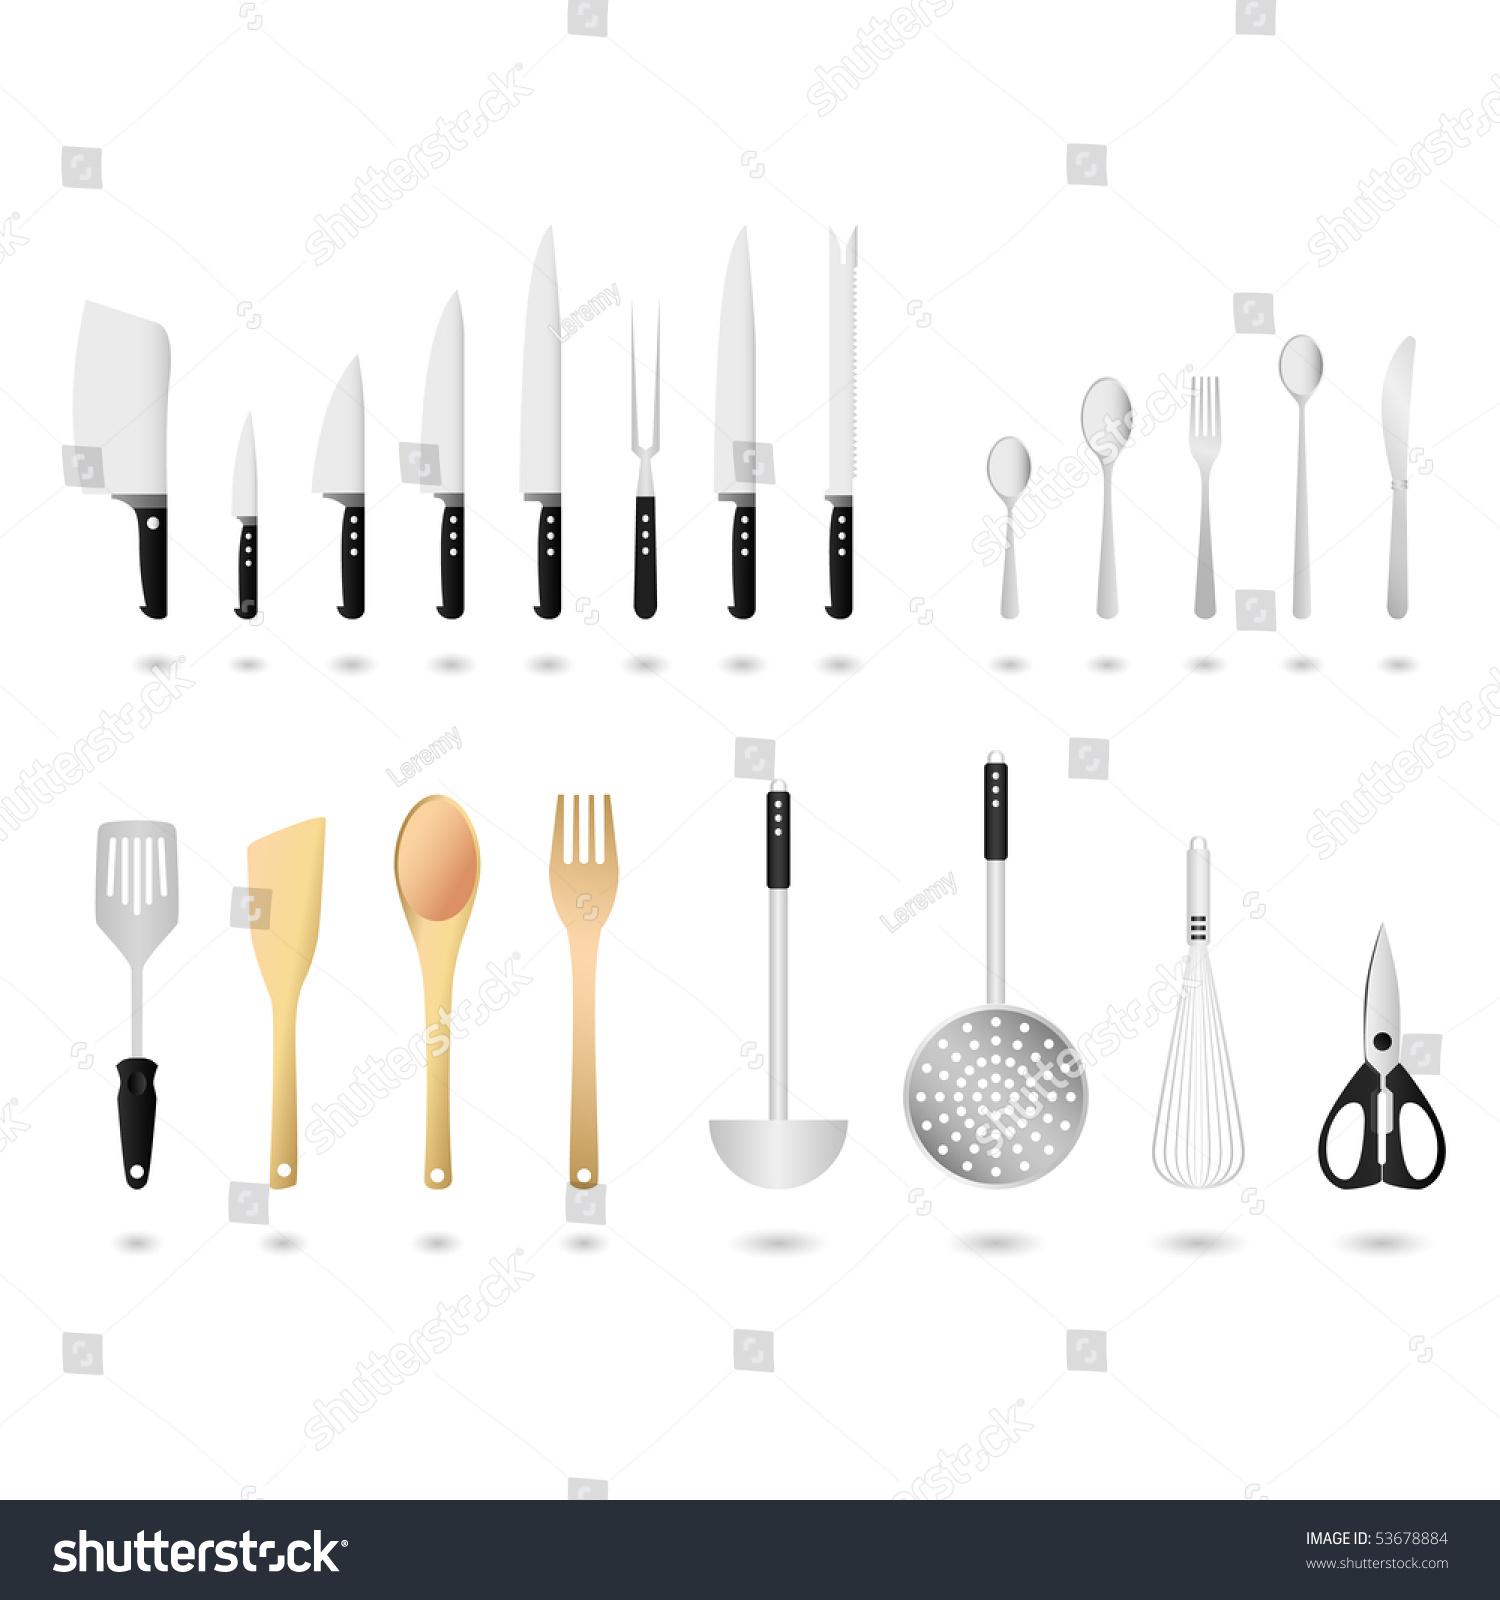 kitchen utensils set vector stock vector shutterstock